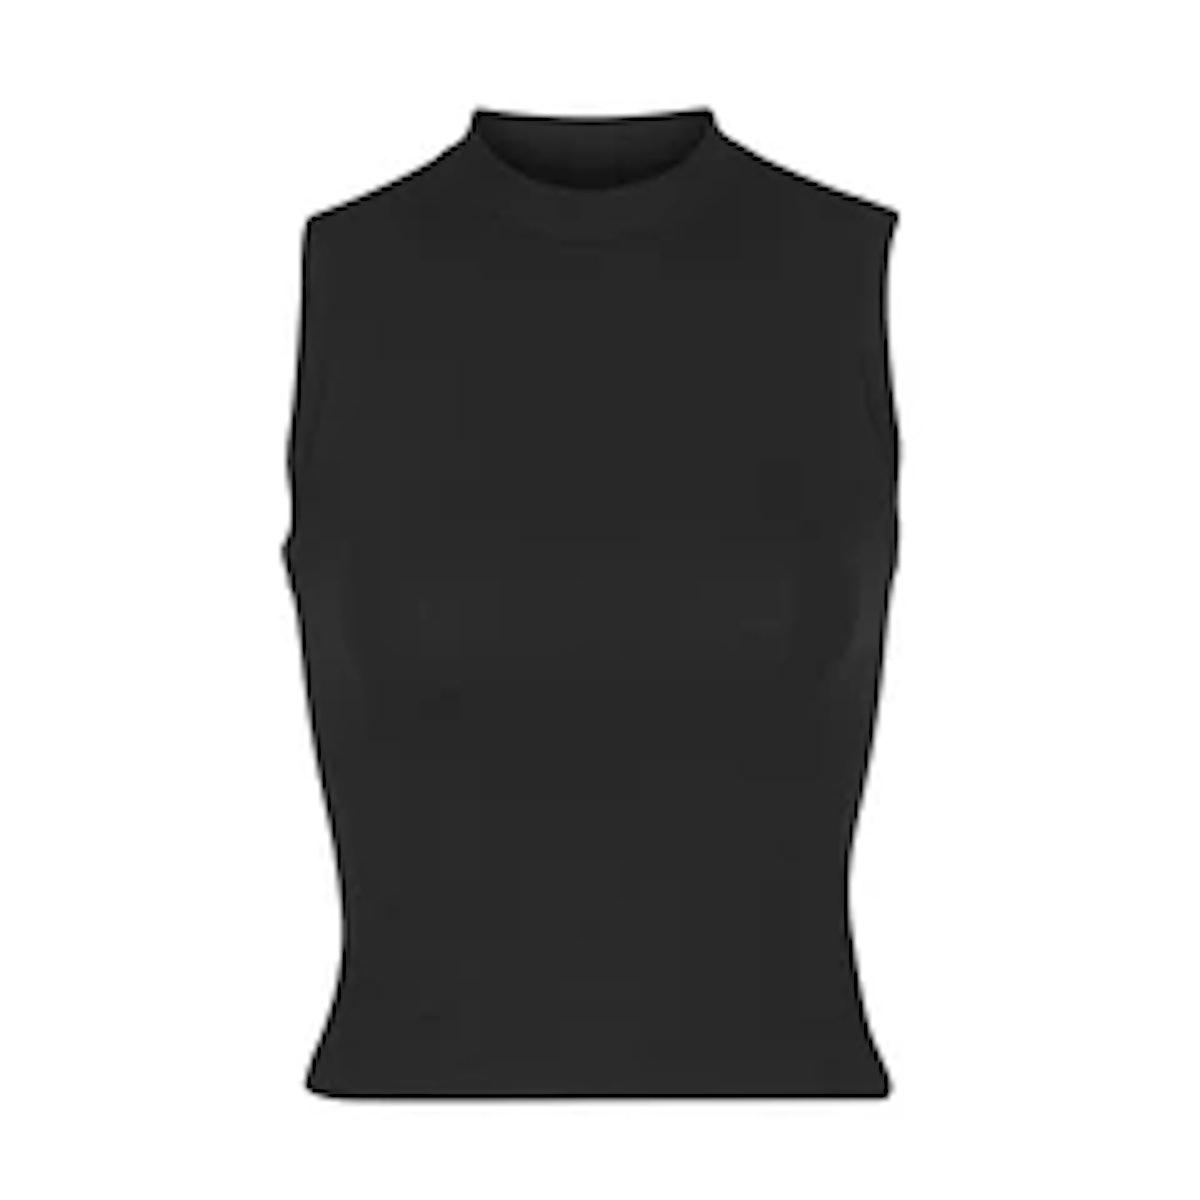 SKIM's cotton jersey mock neck tank in black.